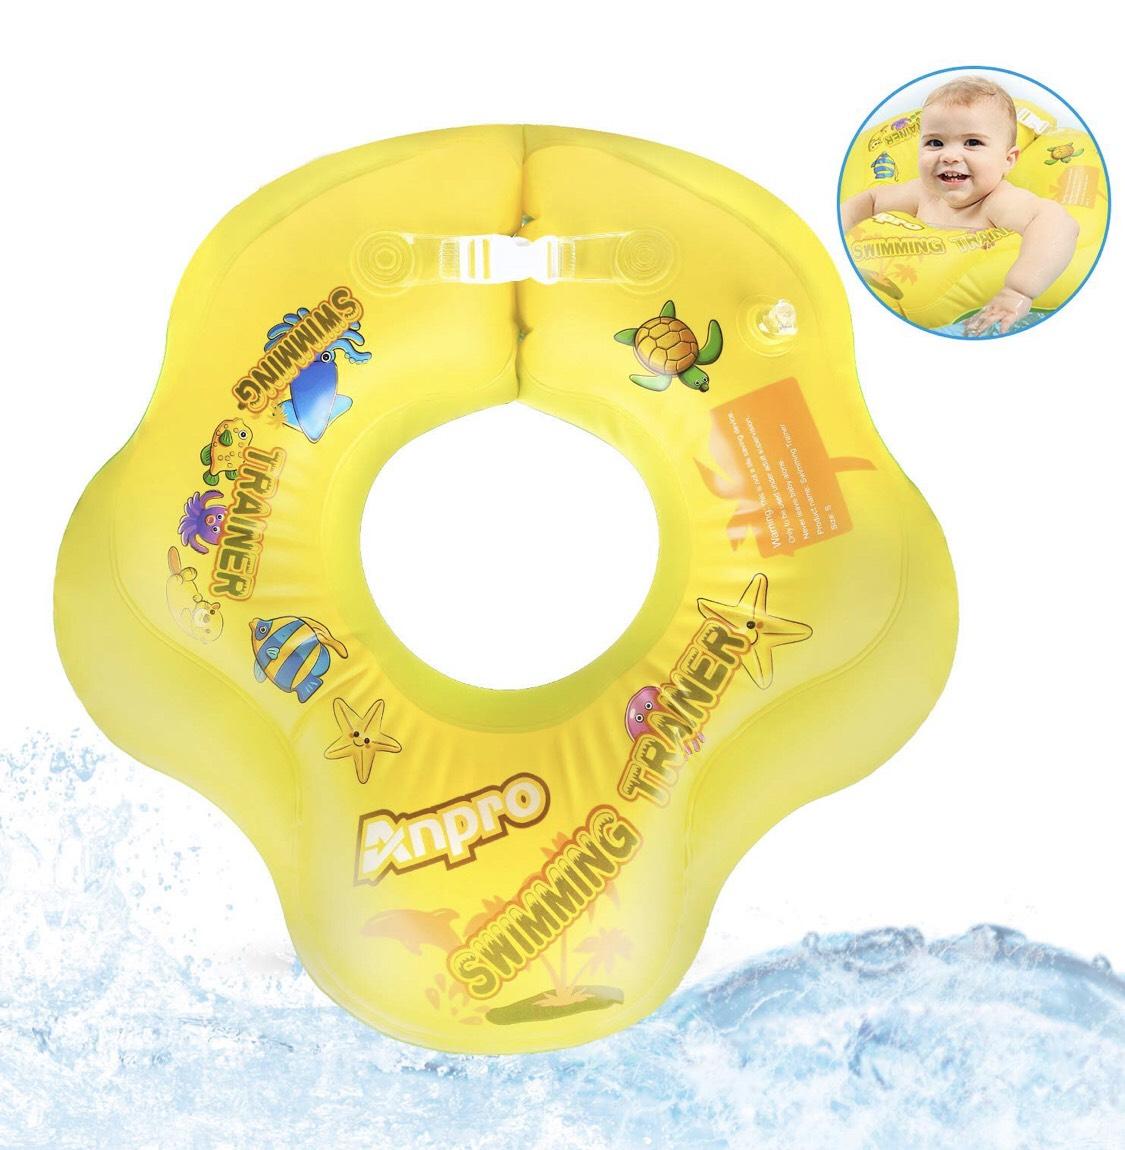 Flotador Bebé para Ayuda de natación